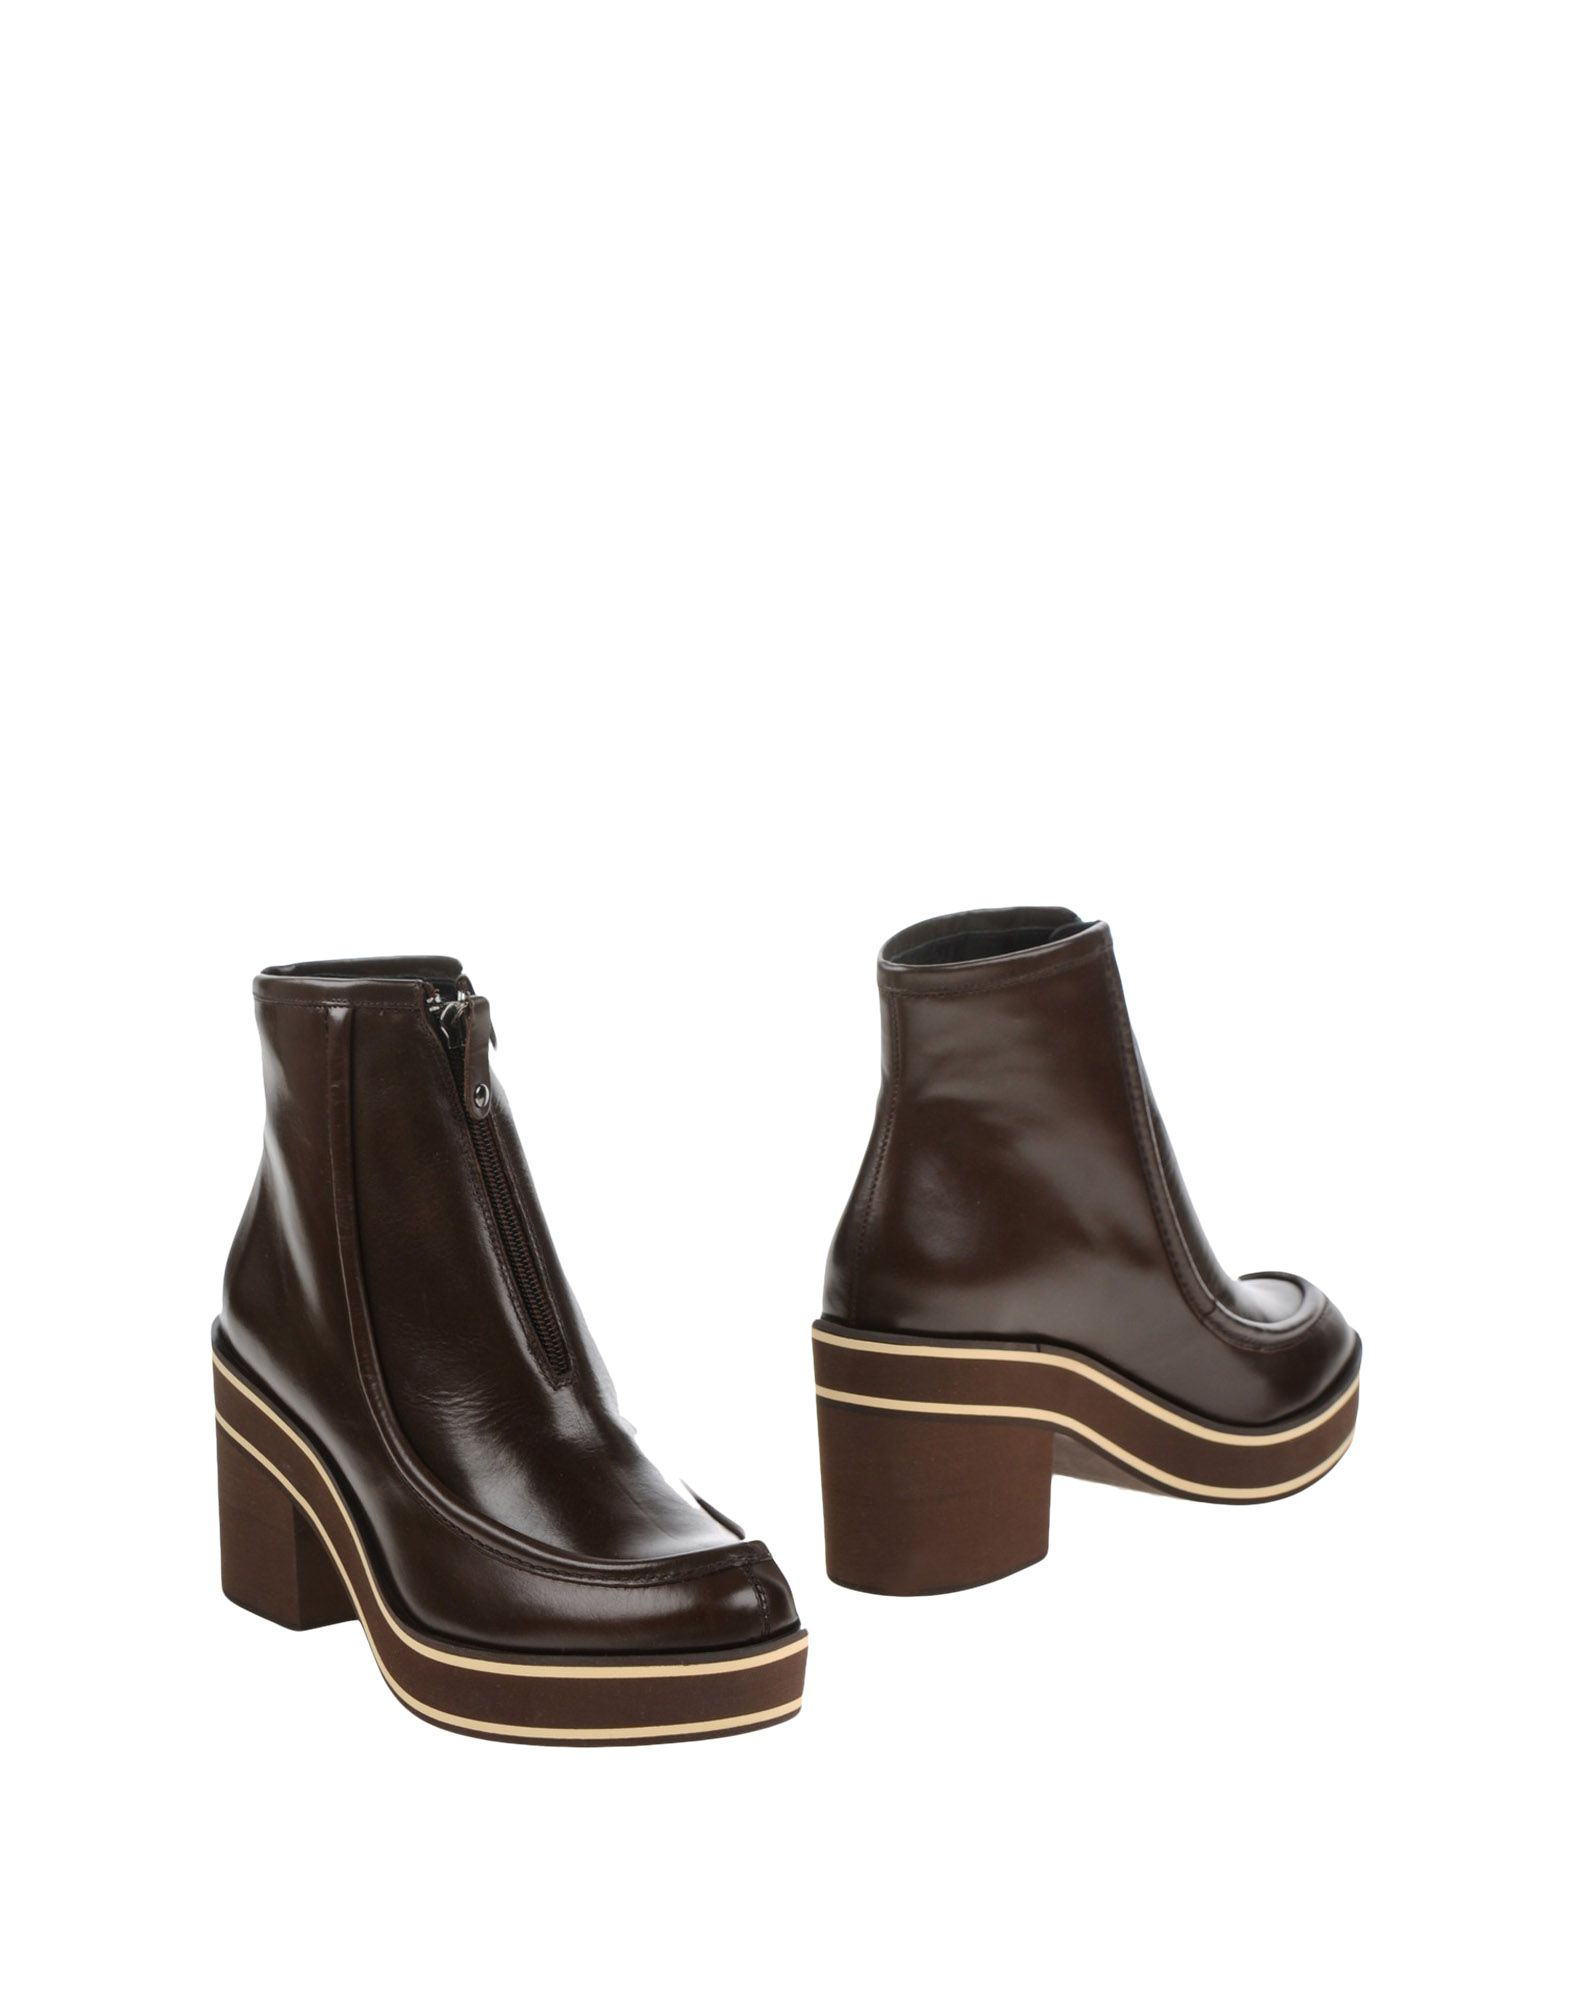 Stilvolle Stiefelette billige Schuhe Paloma Barceló Stiefelette Stilvolle Damen  11215049XU 2980c2